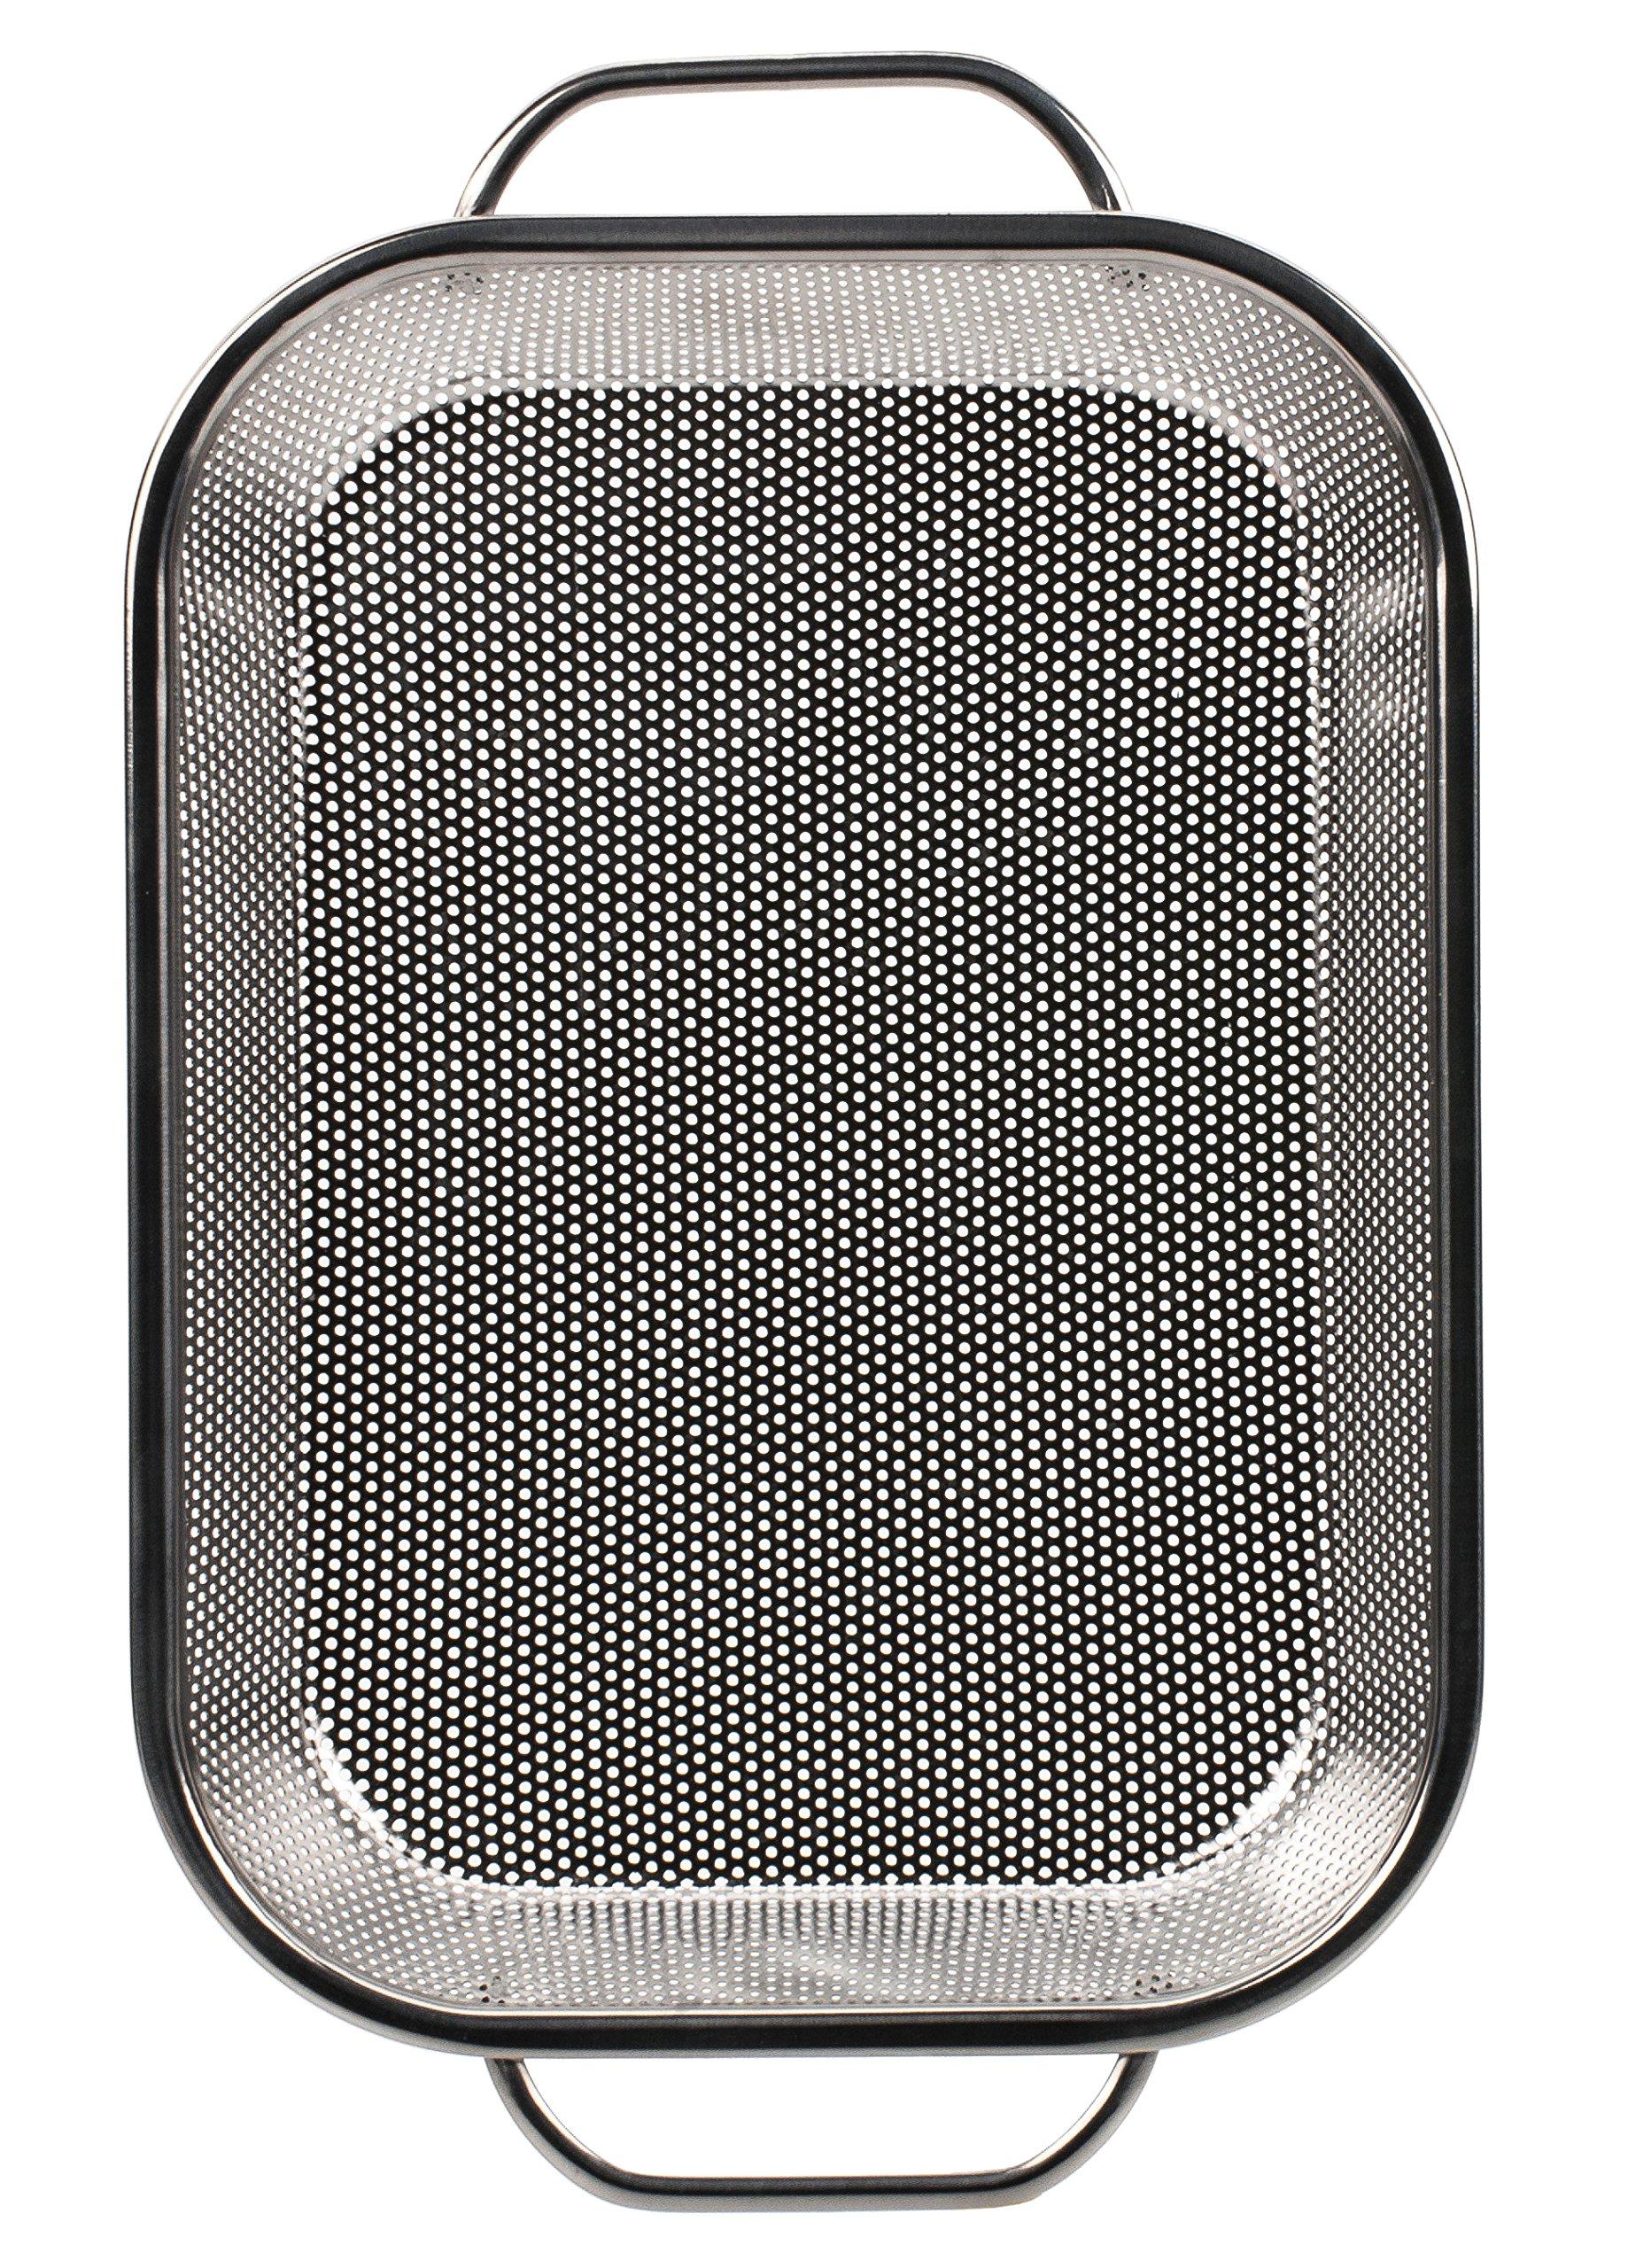 RSVP BQ-RP BBQ Precision Pierced Stainless Steel Roasting Pan